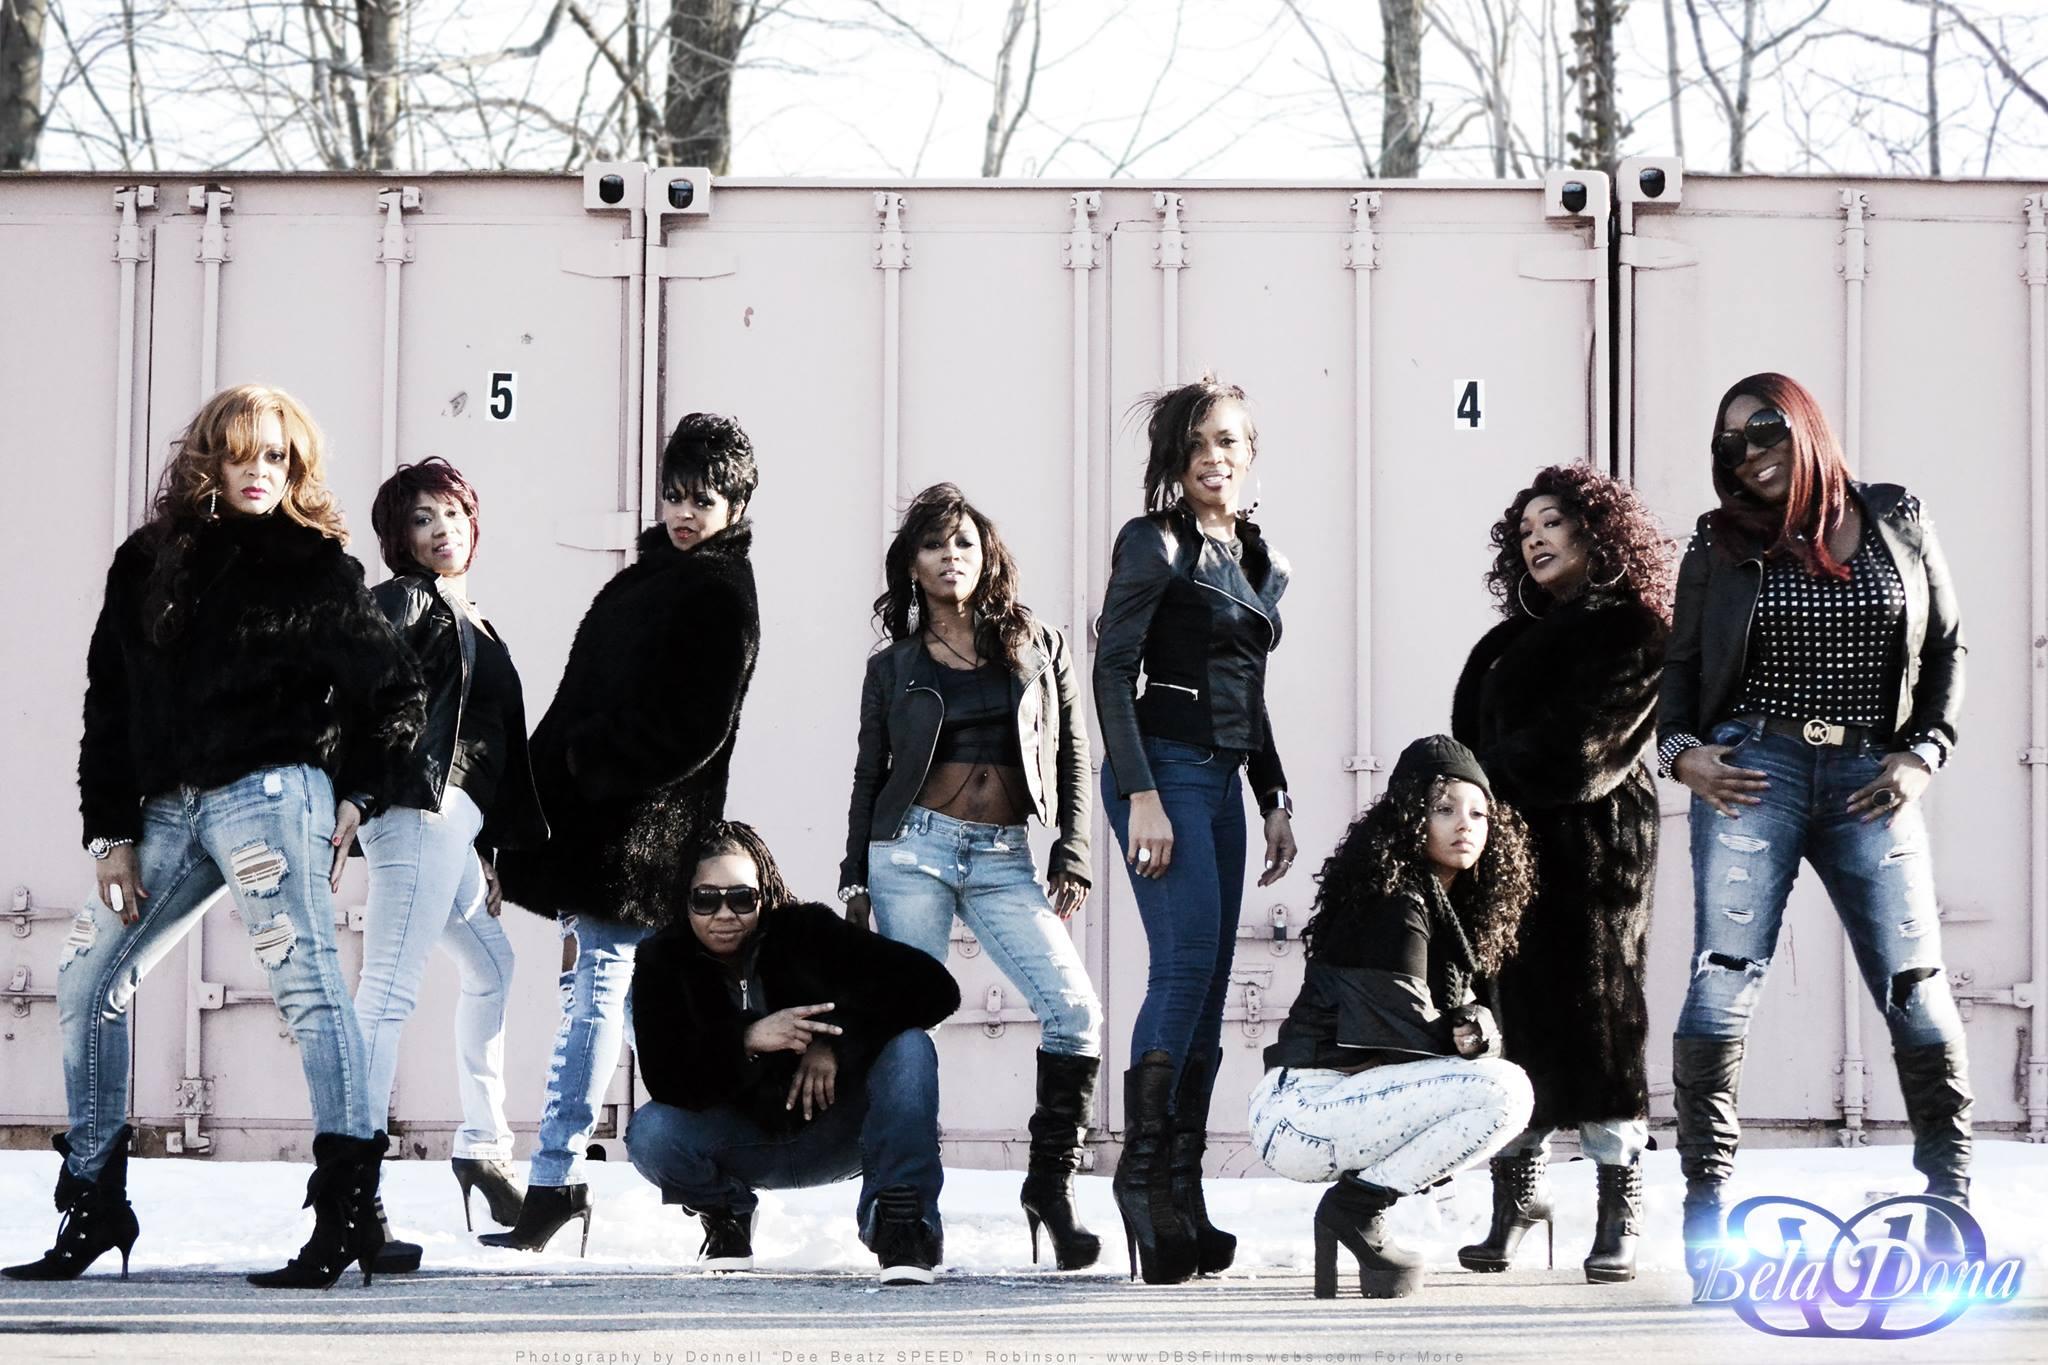 Be'la Dona Group Photo